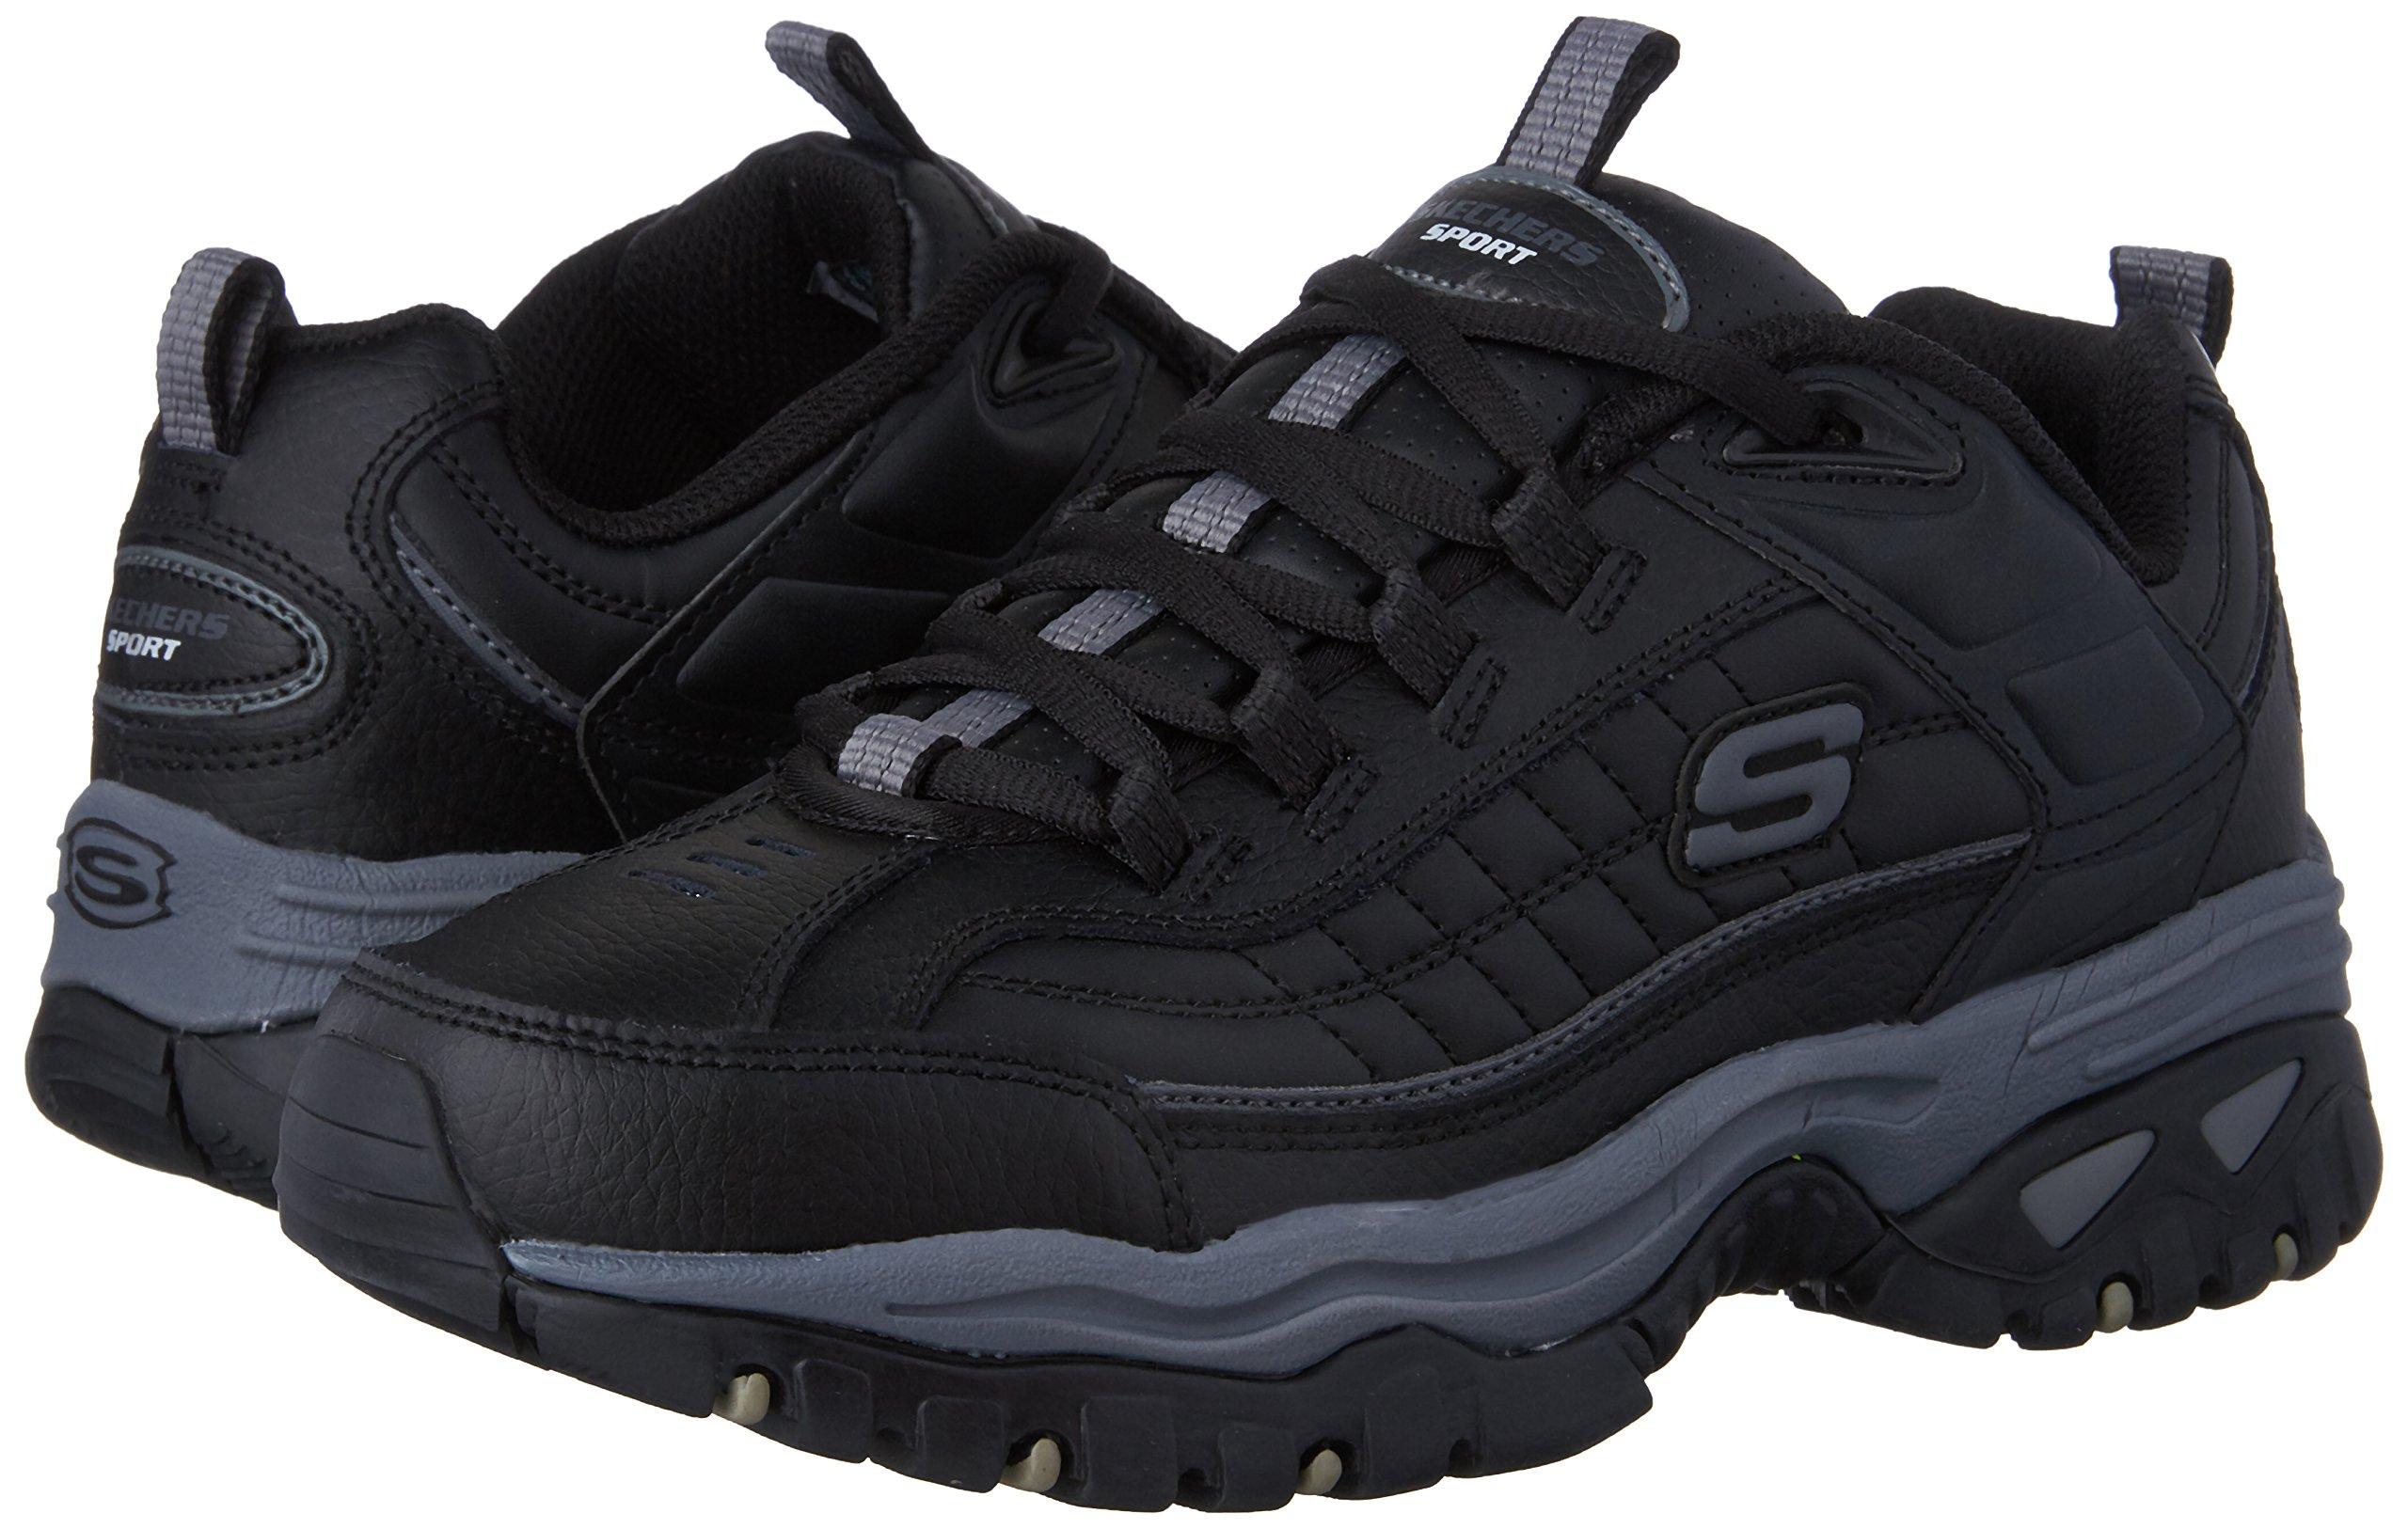 Skechers Men's Energy Afterburn Lace-Up Sneaker,Black/Gray,14 M US by Skechers (Image #6)